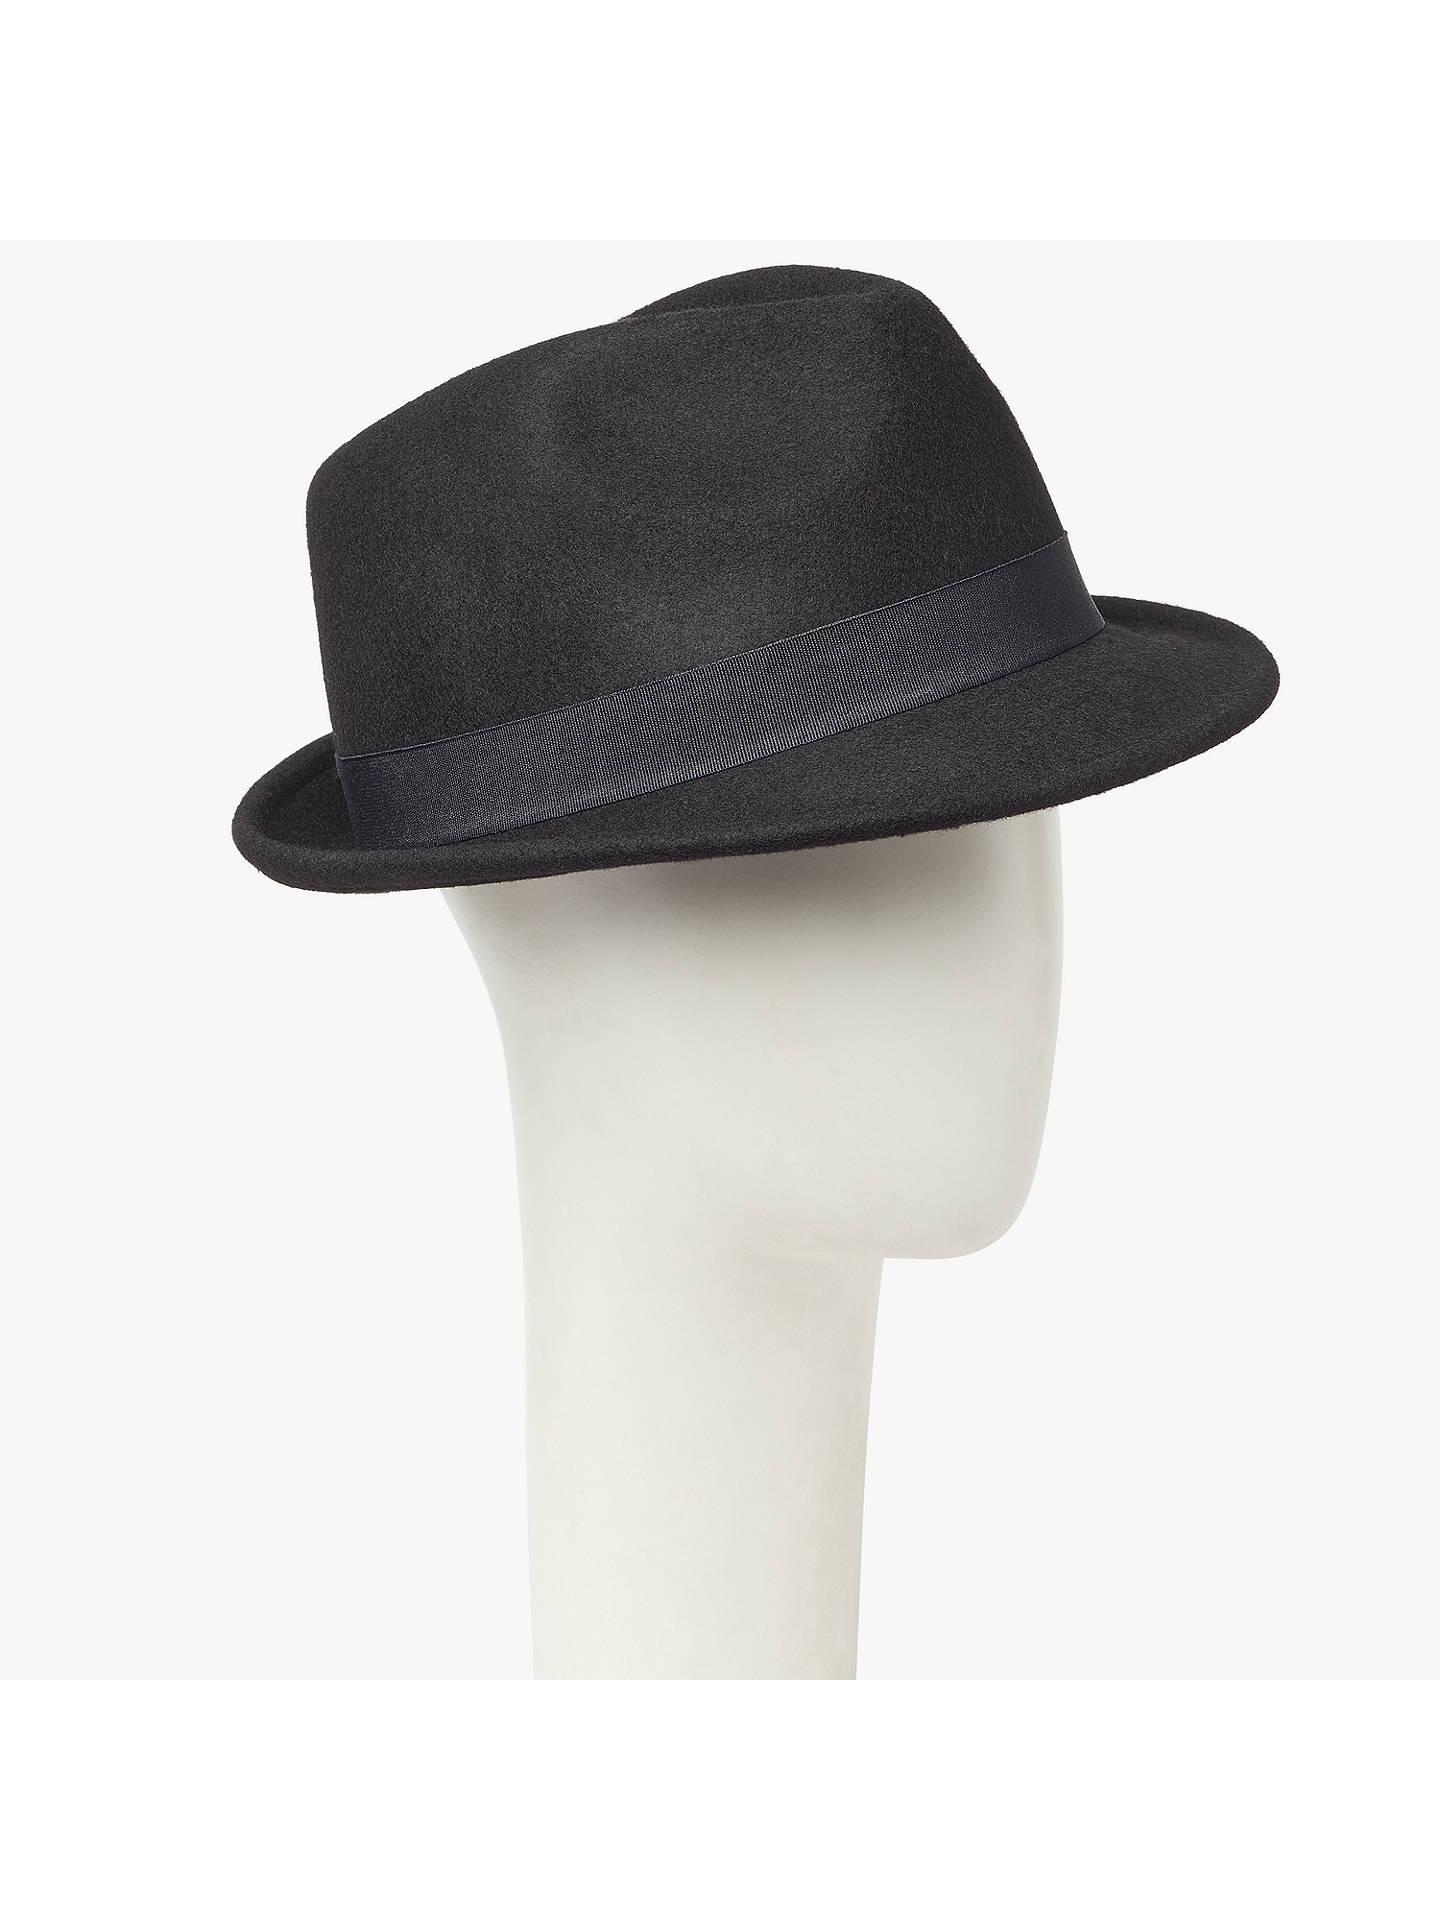 BuyJohn Lewis Wool Trilby Hat bab7bfc6097